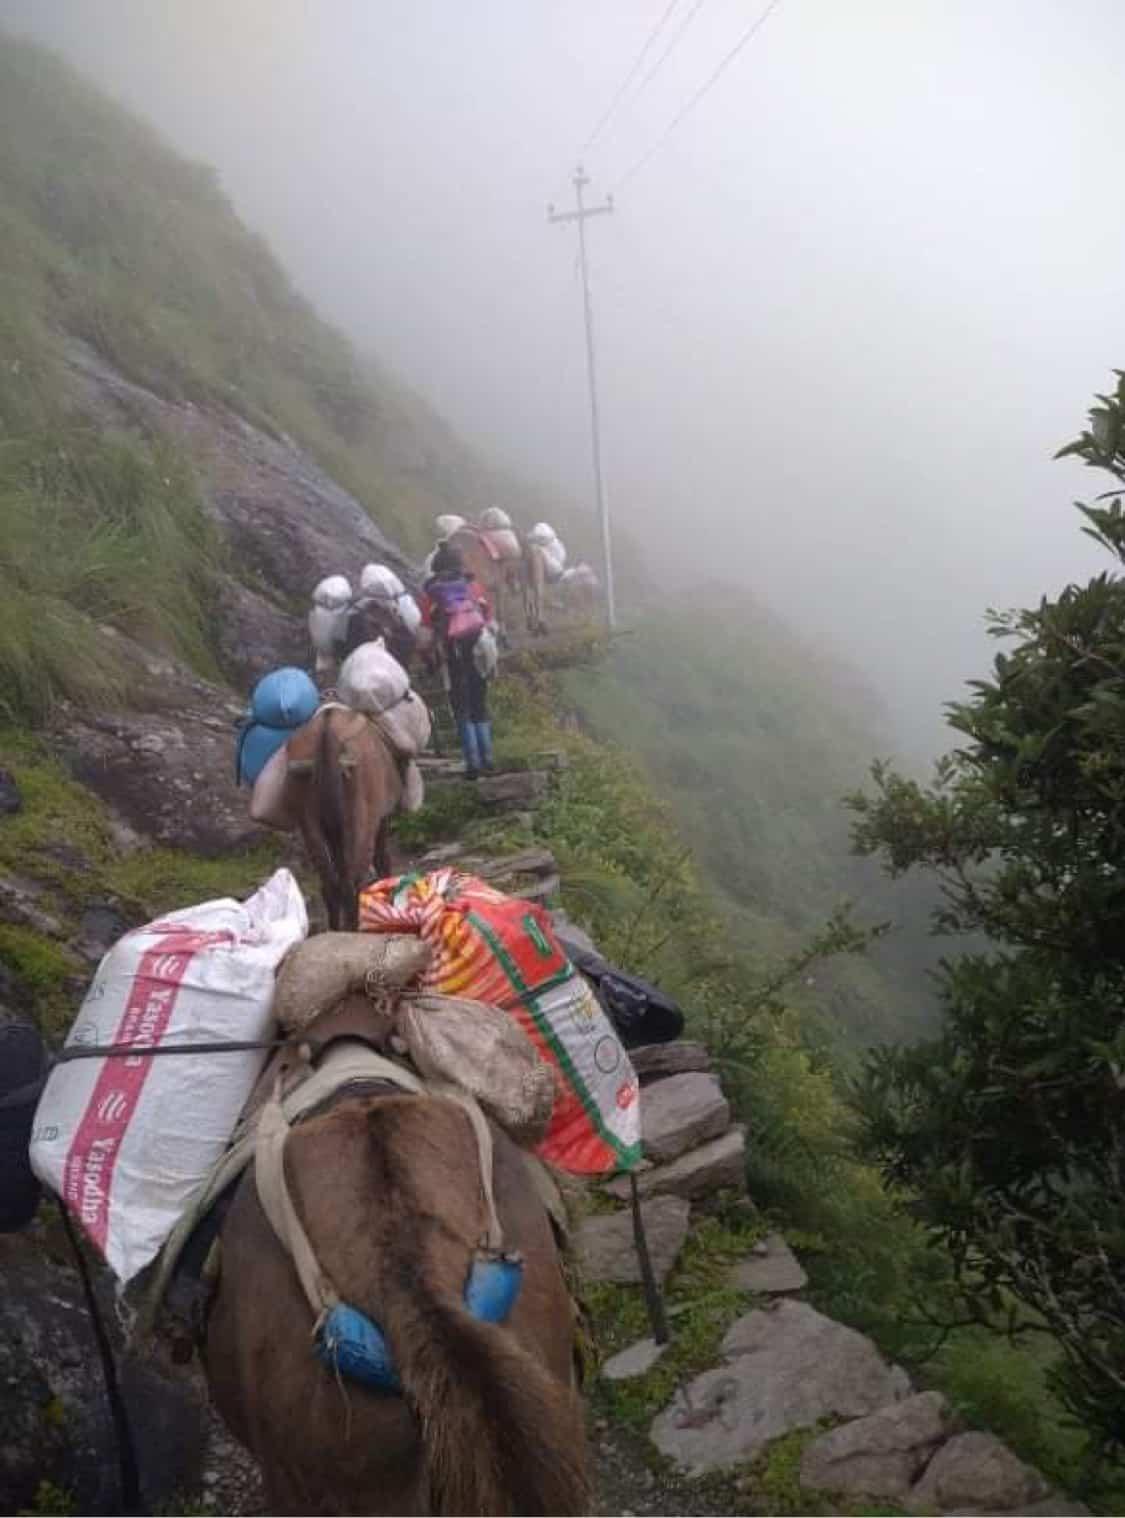 Mountain Heart Nepal (MHN) - Langtang Valley Nepal Lead